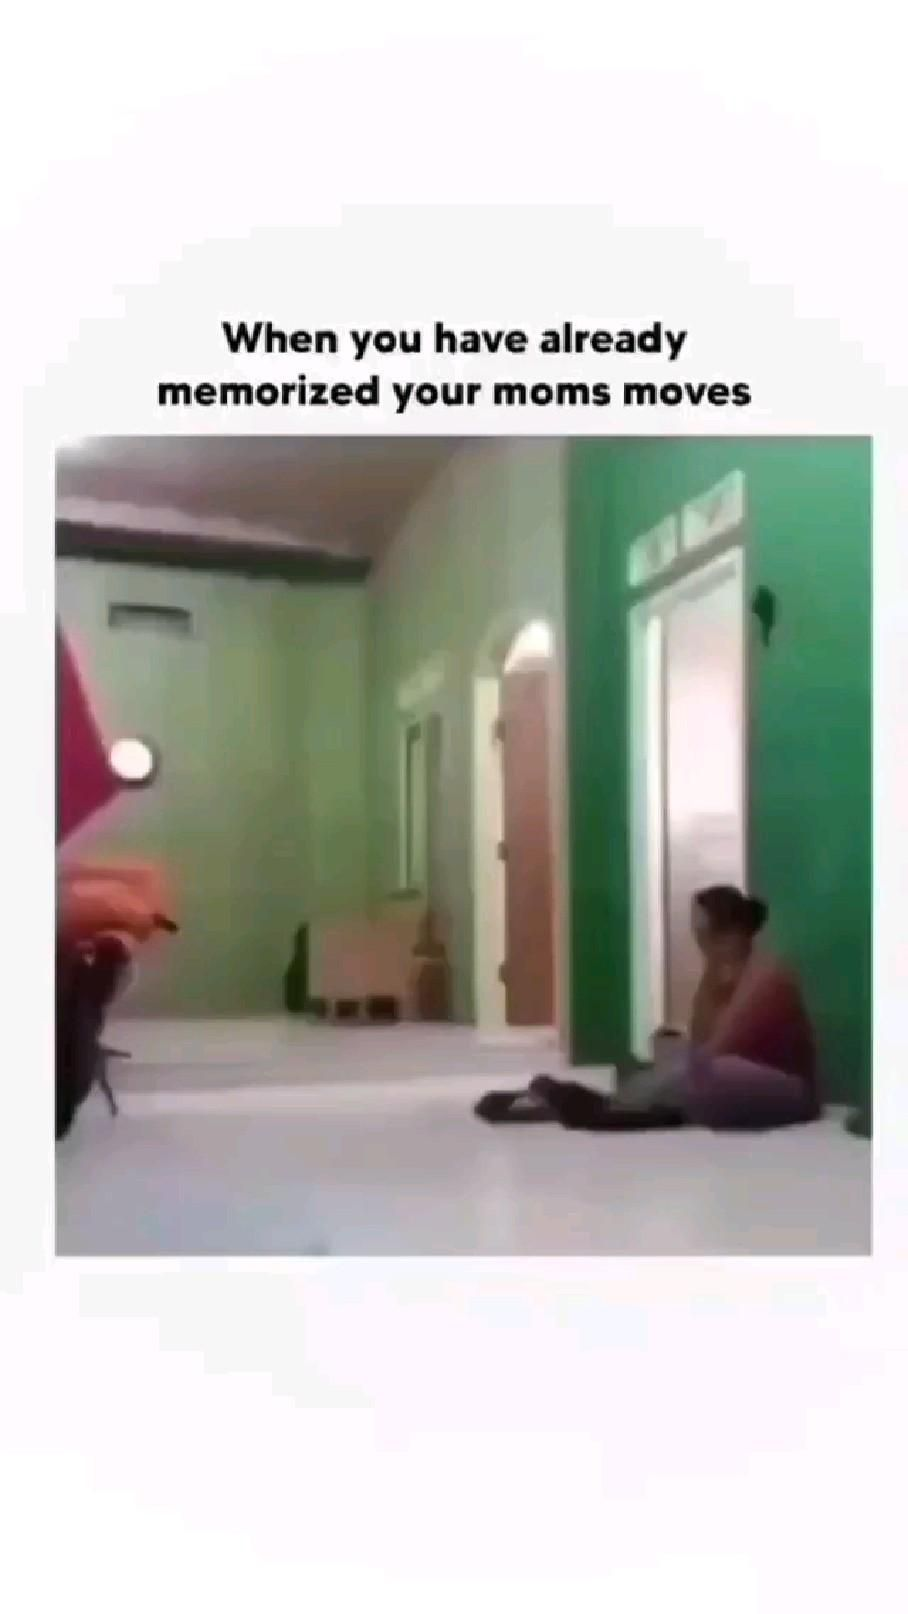 wah bete 🤣 funny boy funny comedy video boy n mom funny video meme video jokes humor videos